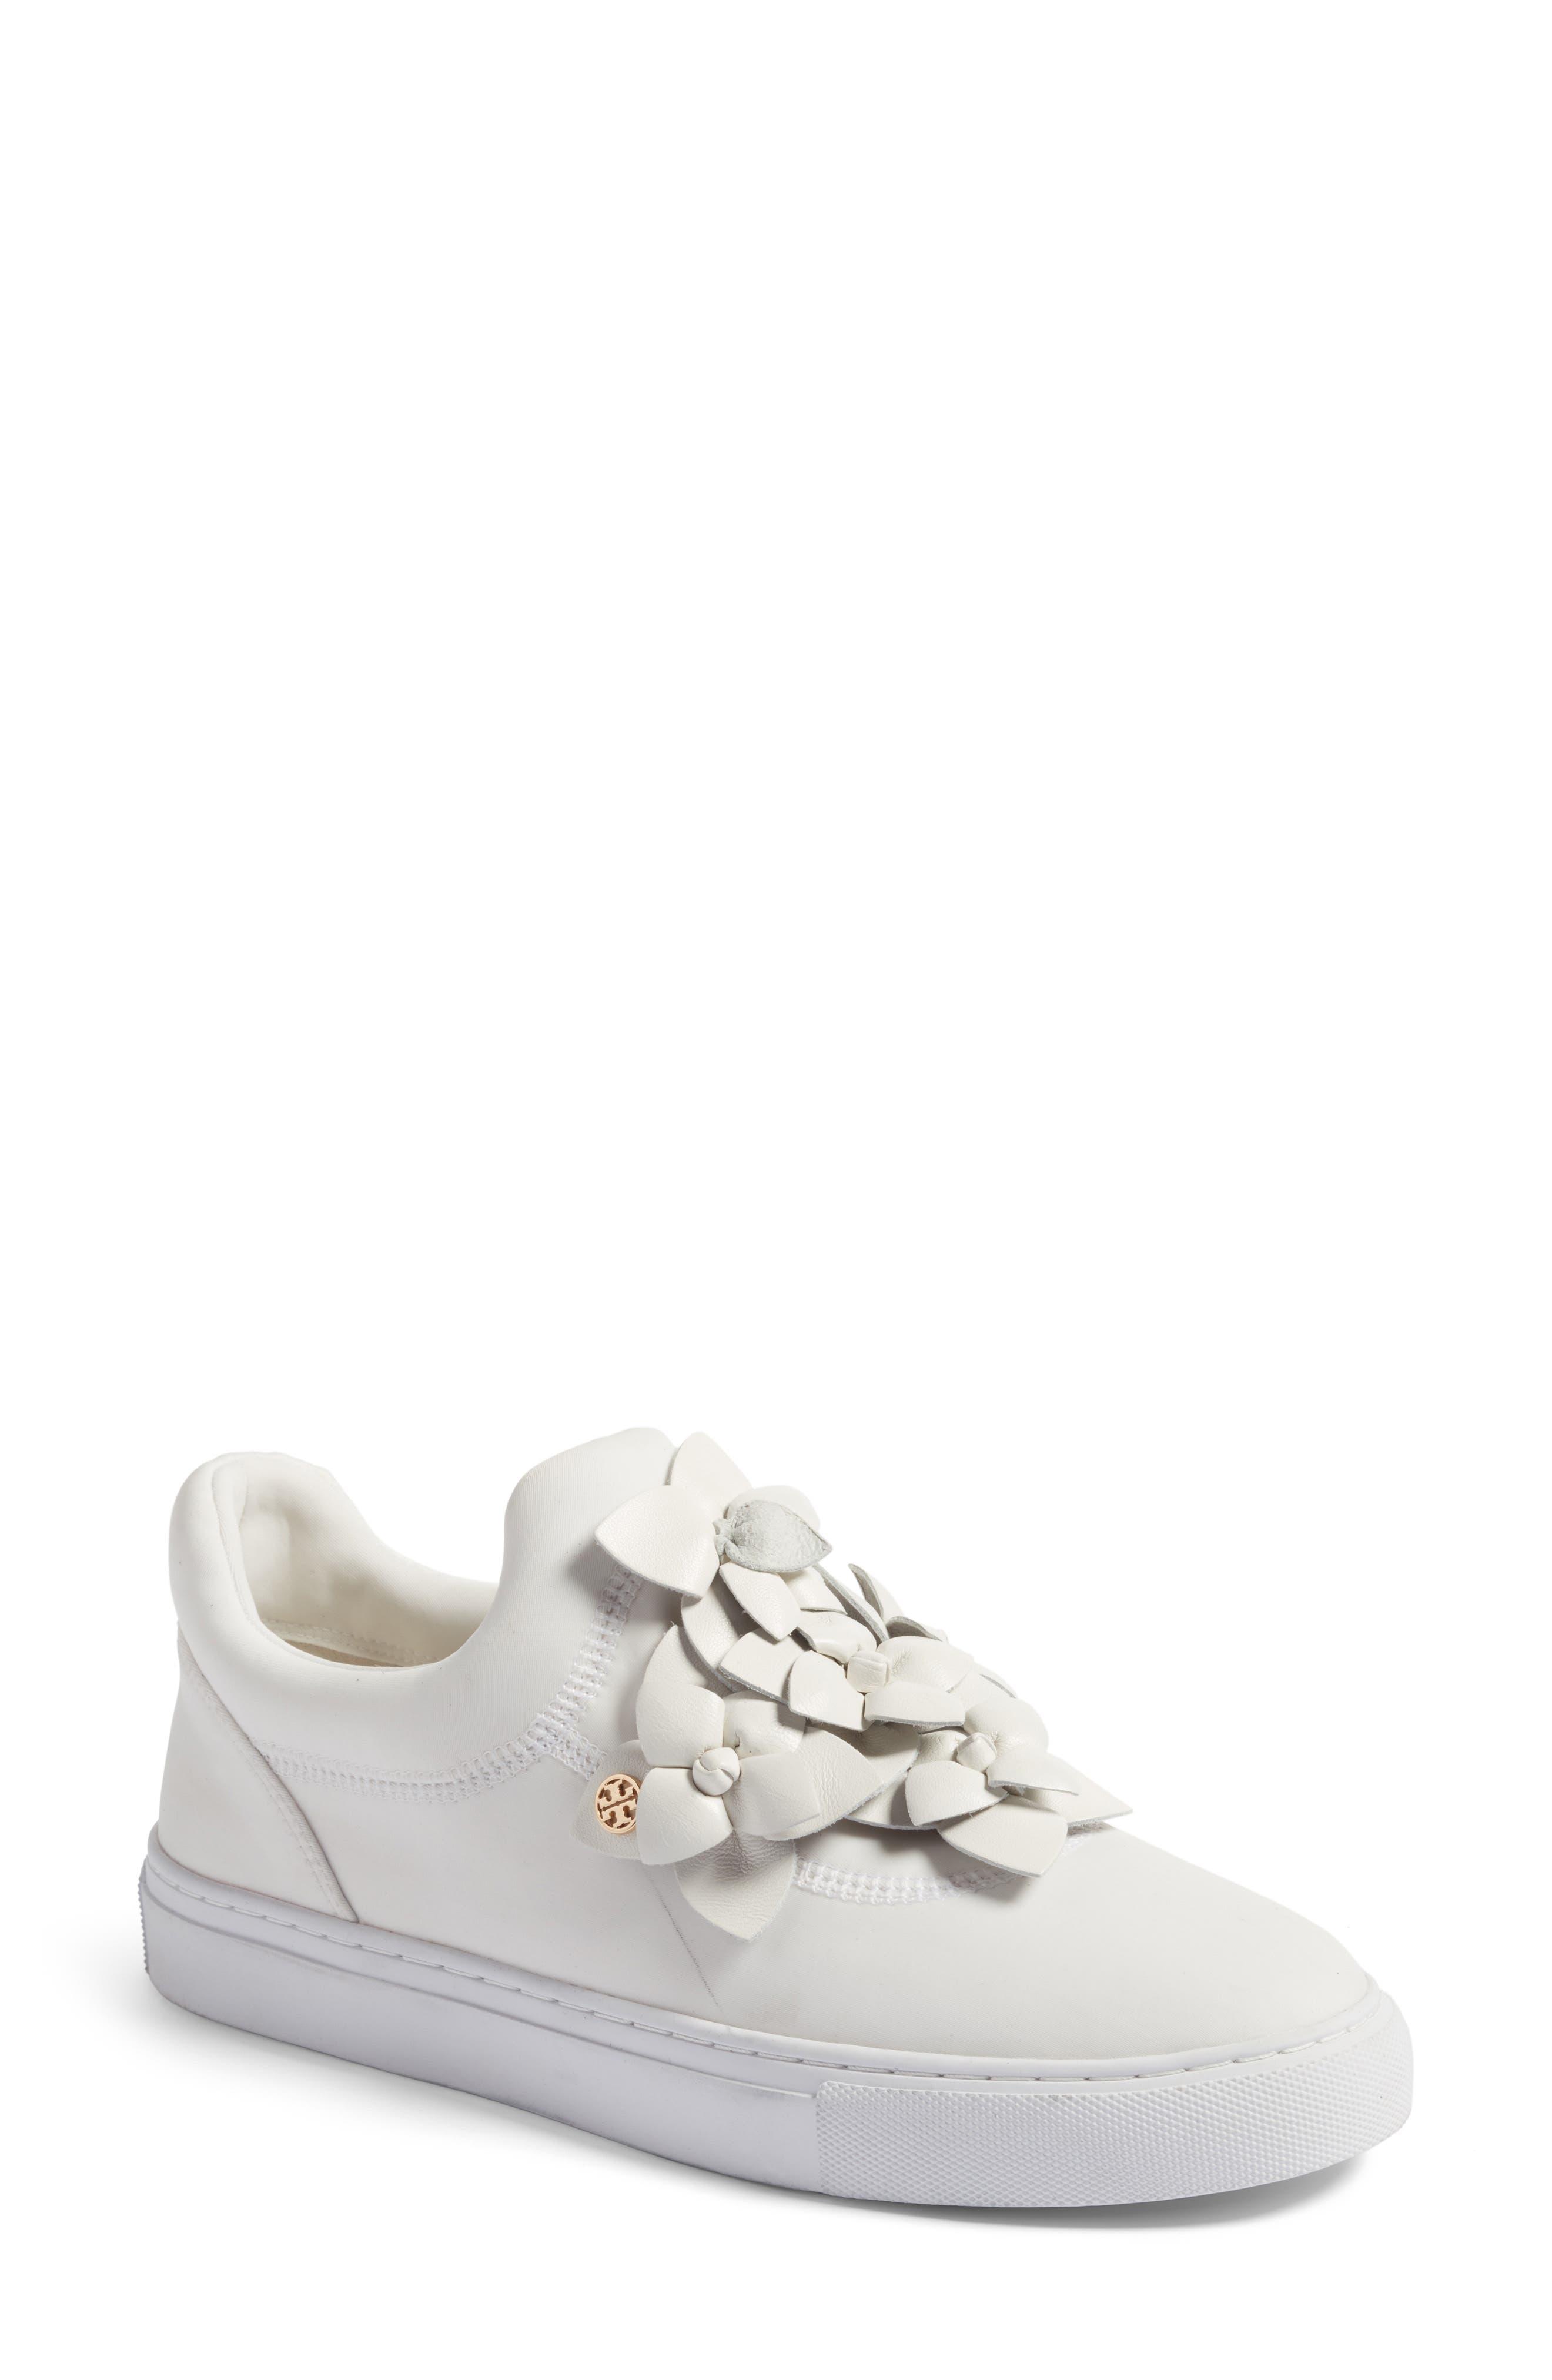 Main Image - Tory Burch Blossom Sneaker (Women)